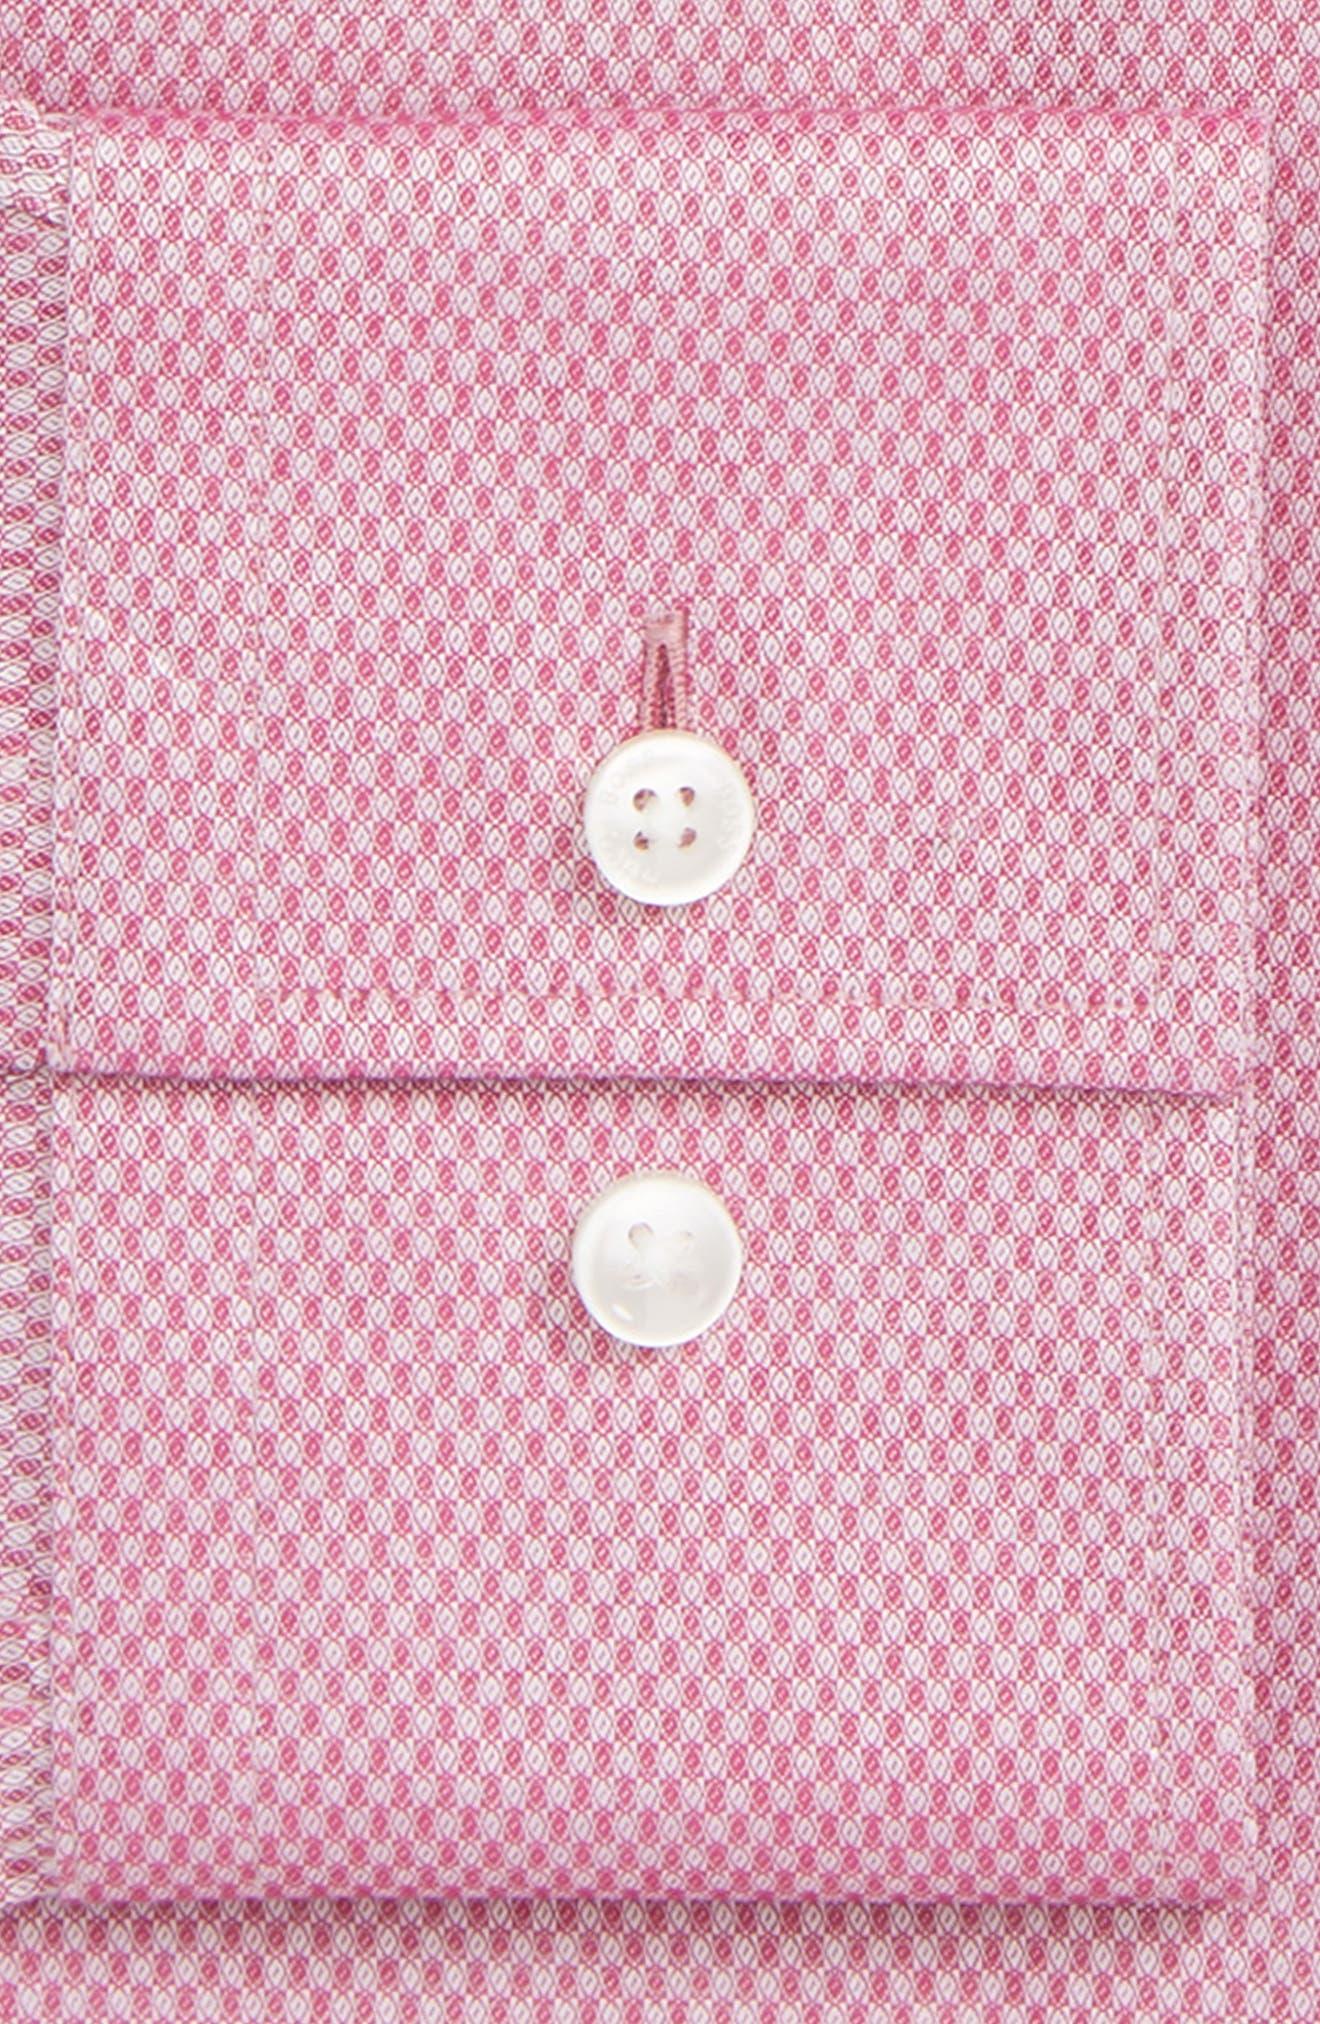 Jenno Slim Fit Solid Dress Shirt,                             Alternate thumbnail 2, color,                             PINK